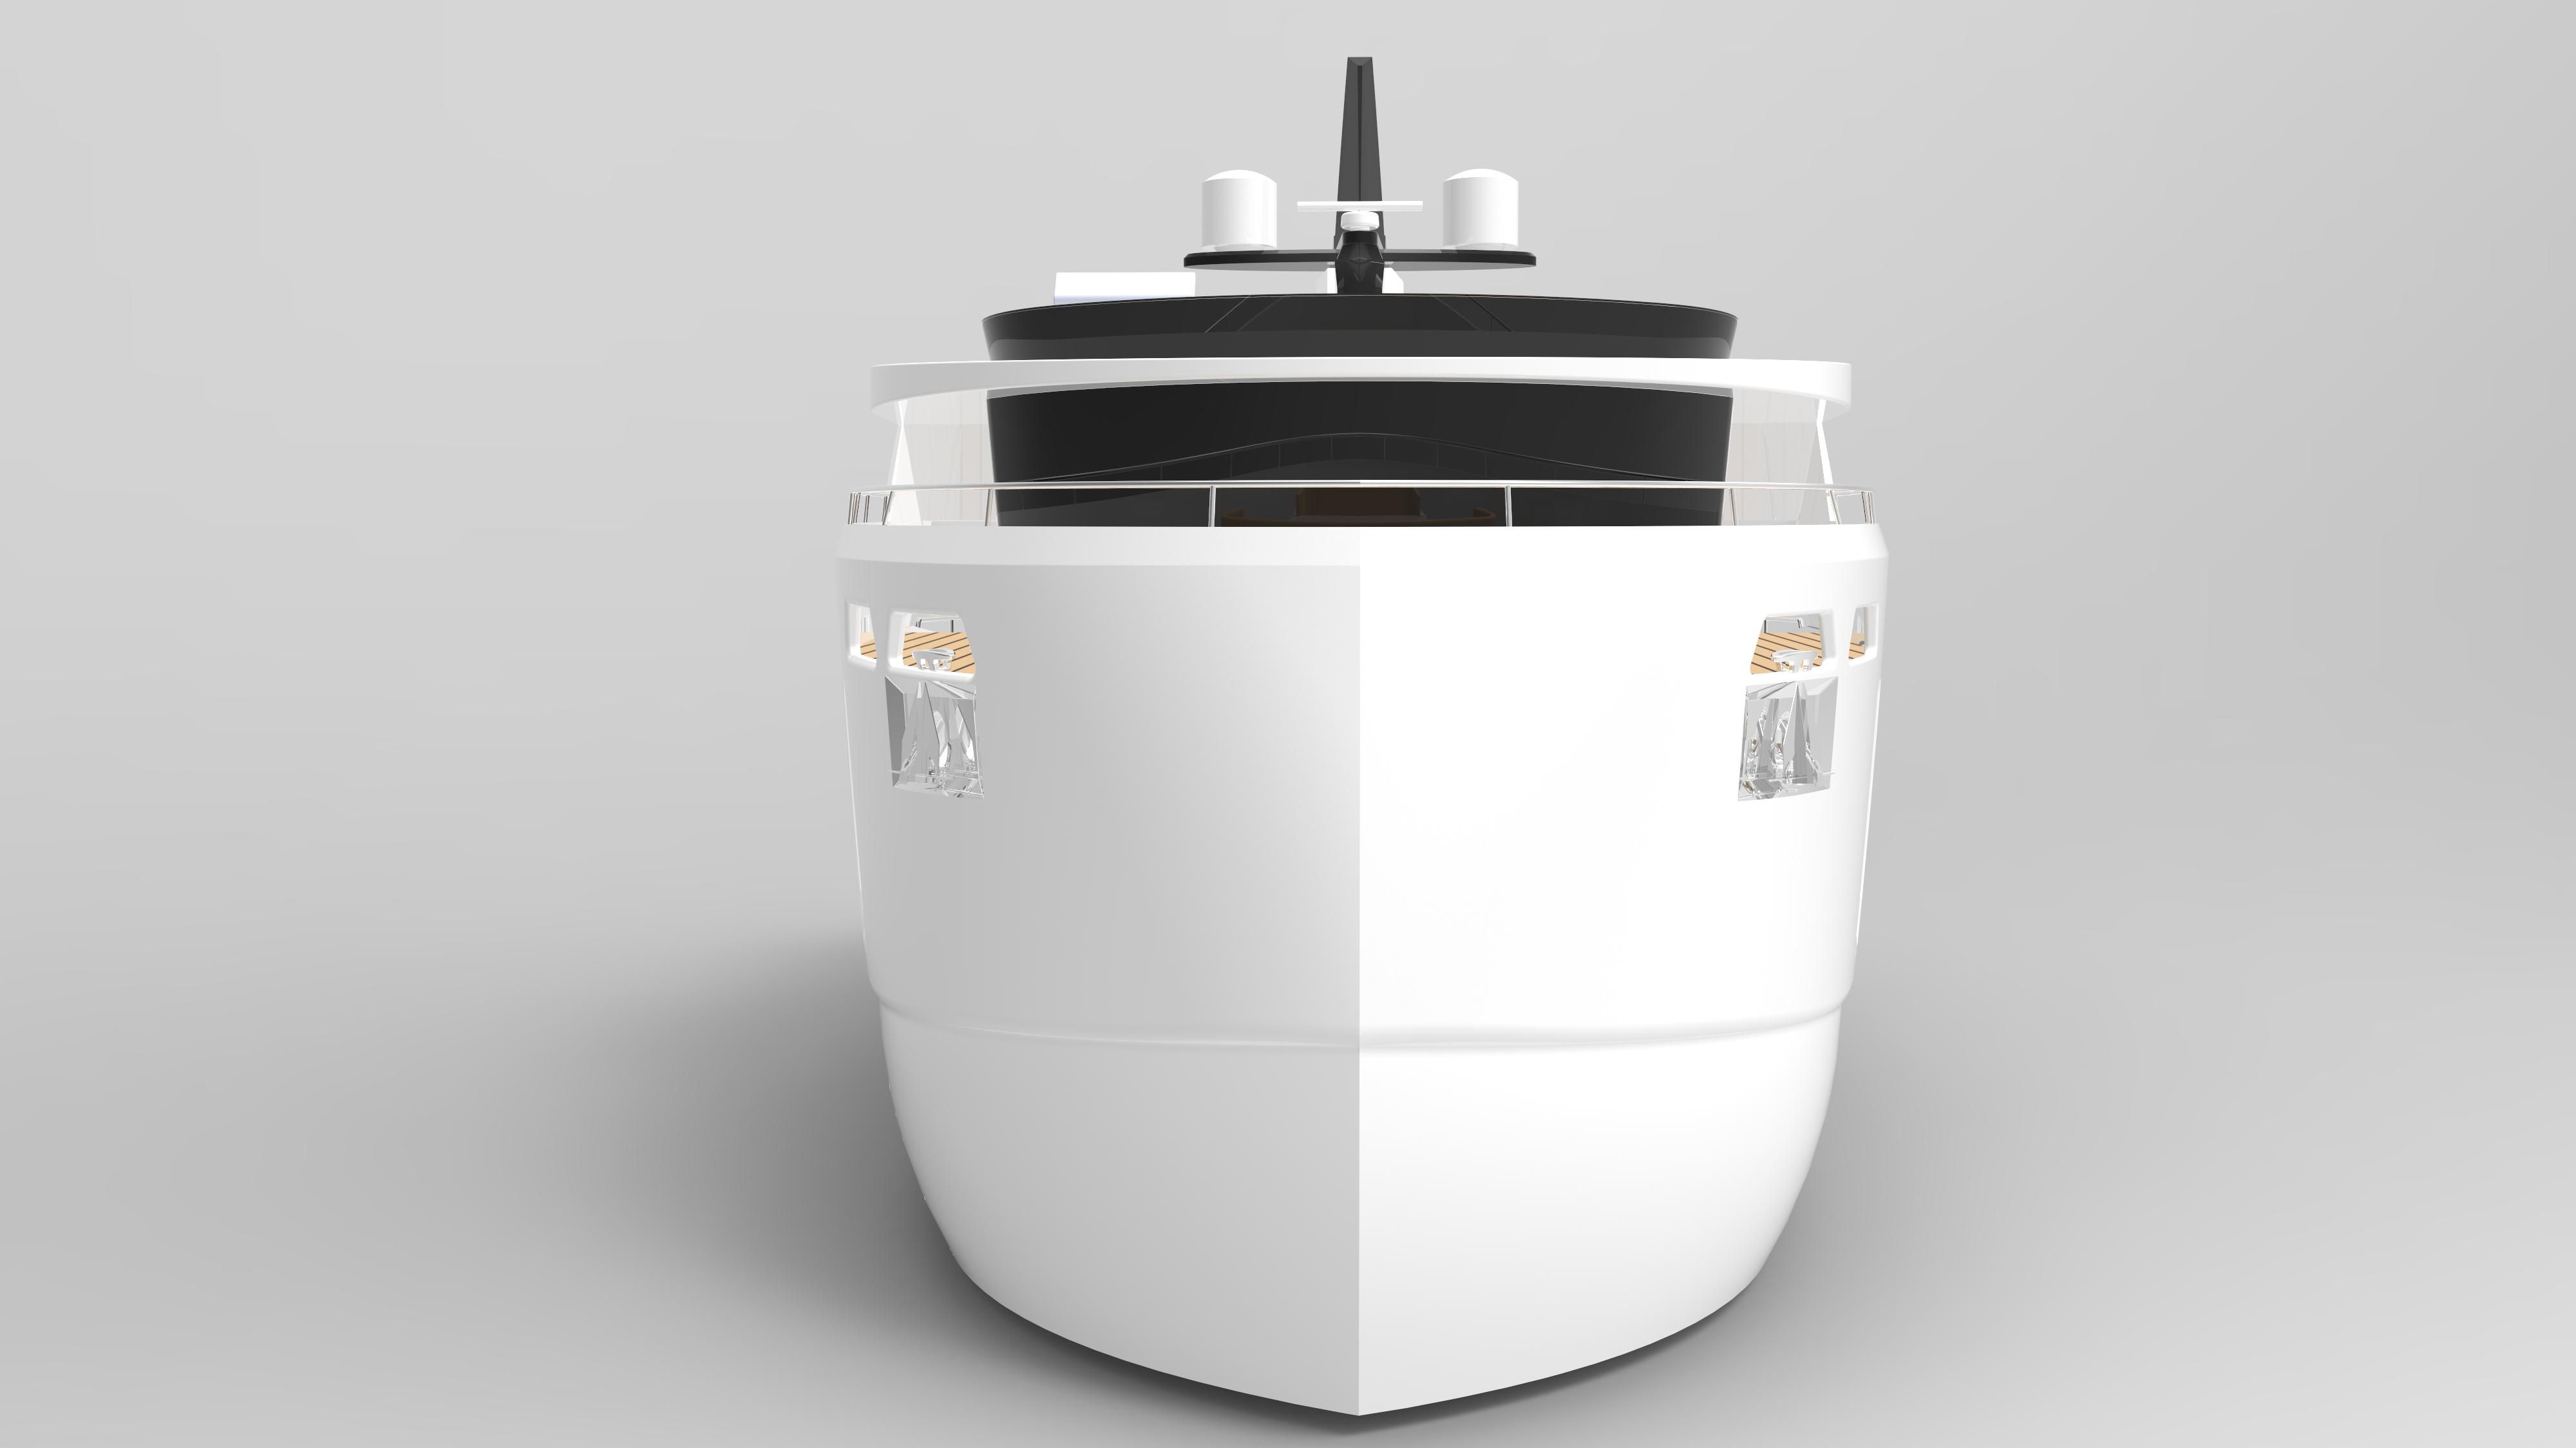 Boat1.32.jpg